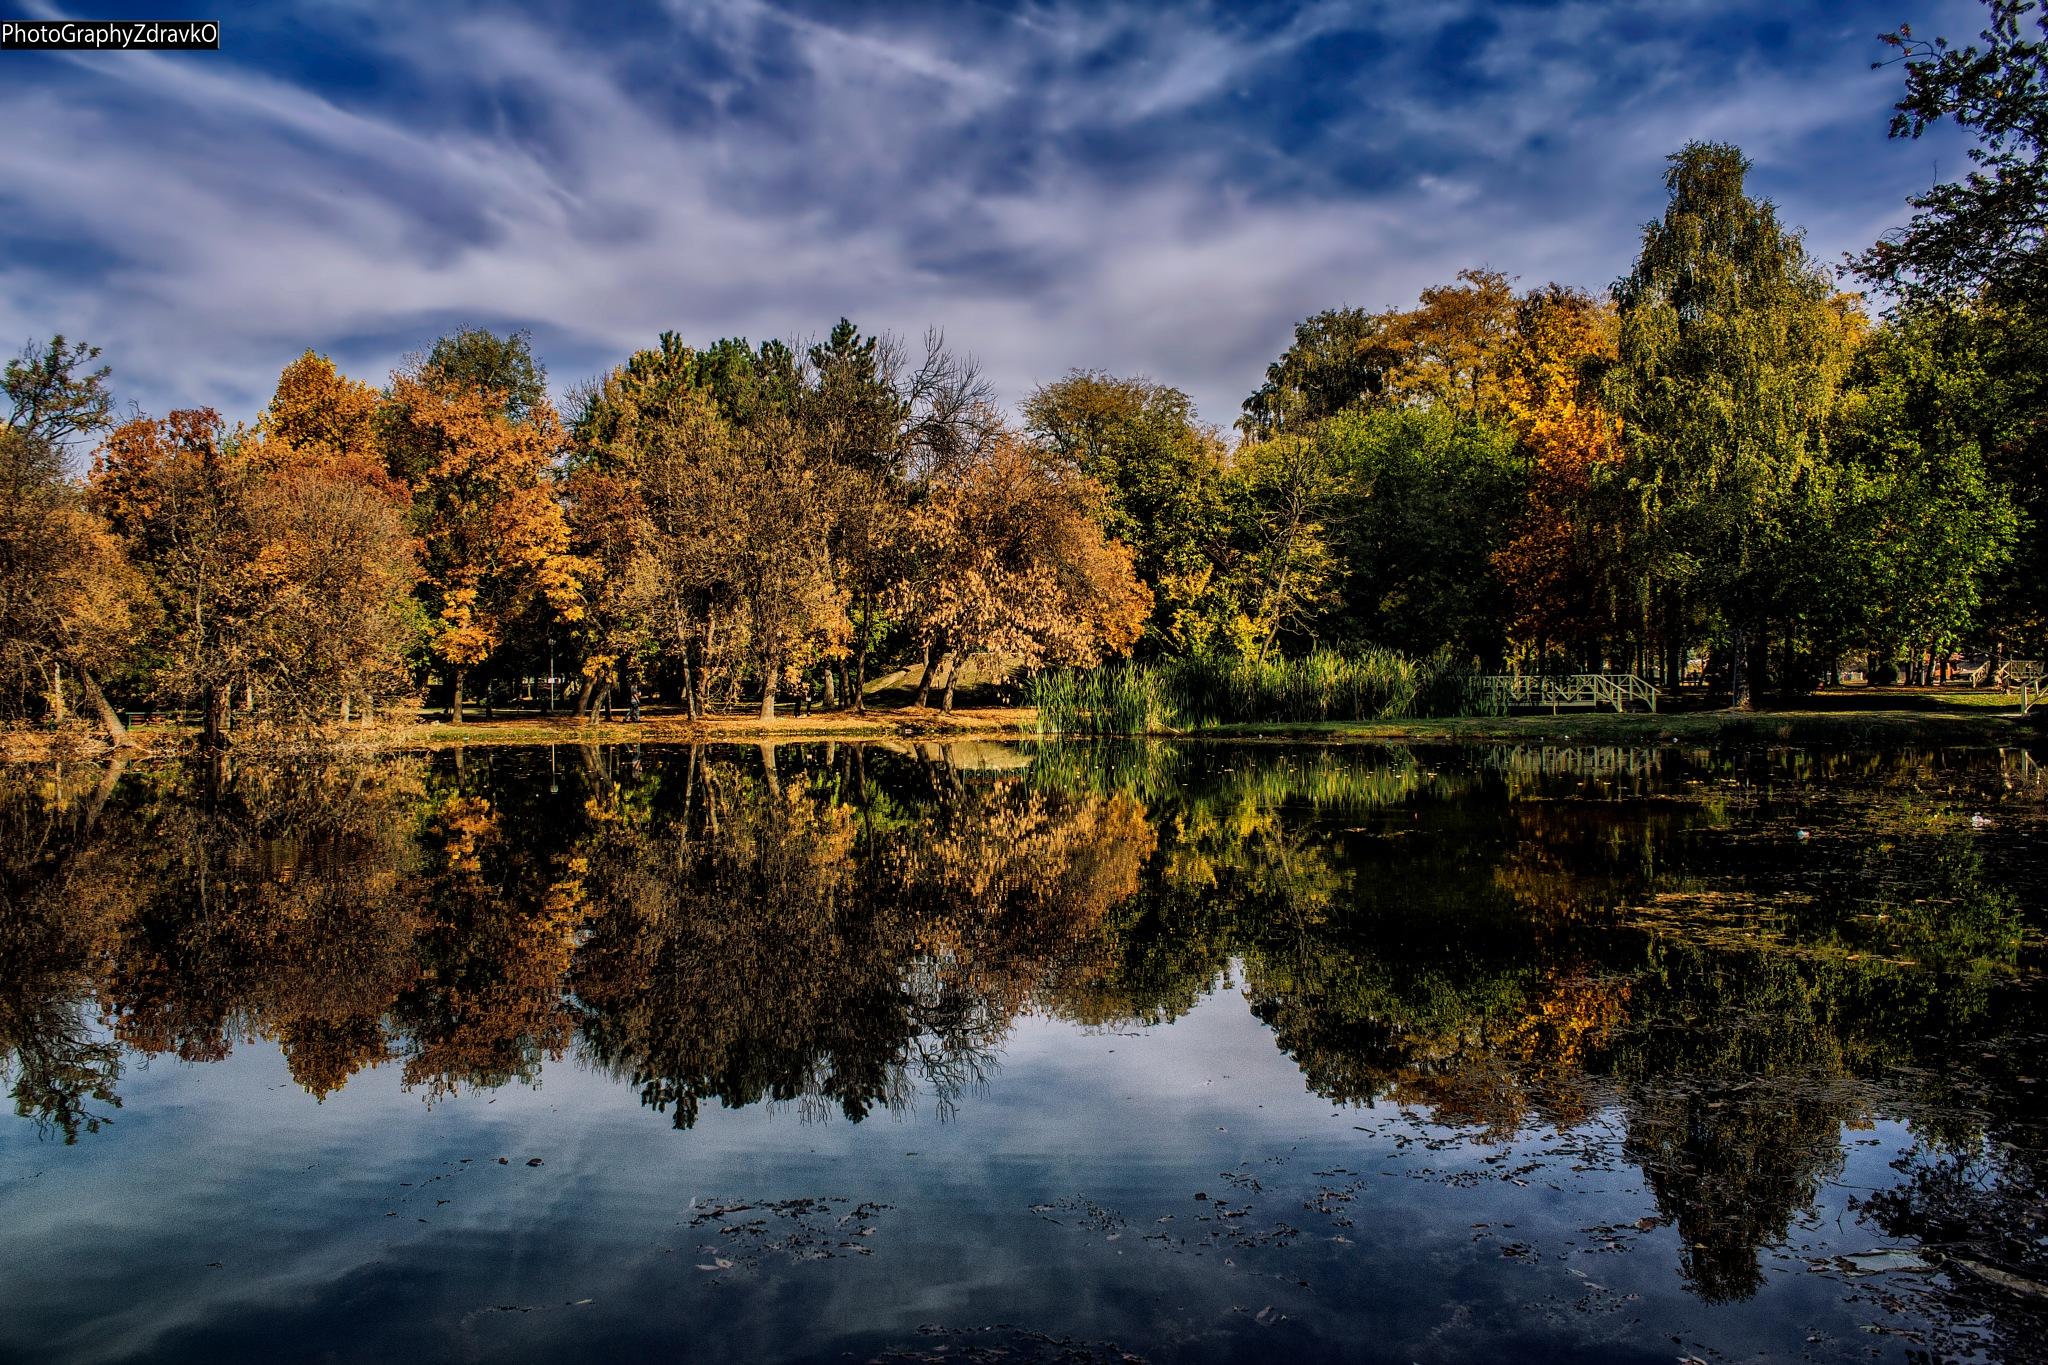 Reflection Nature by zdravko.petkovski.3